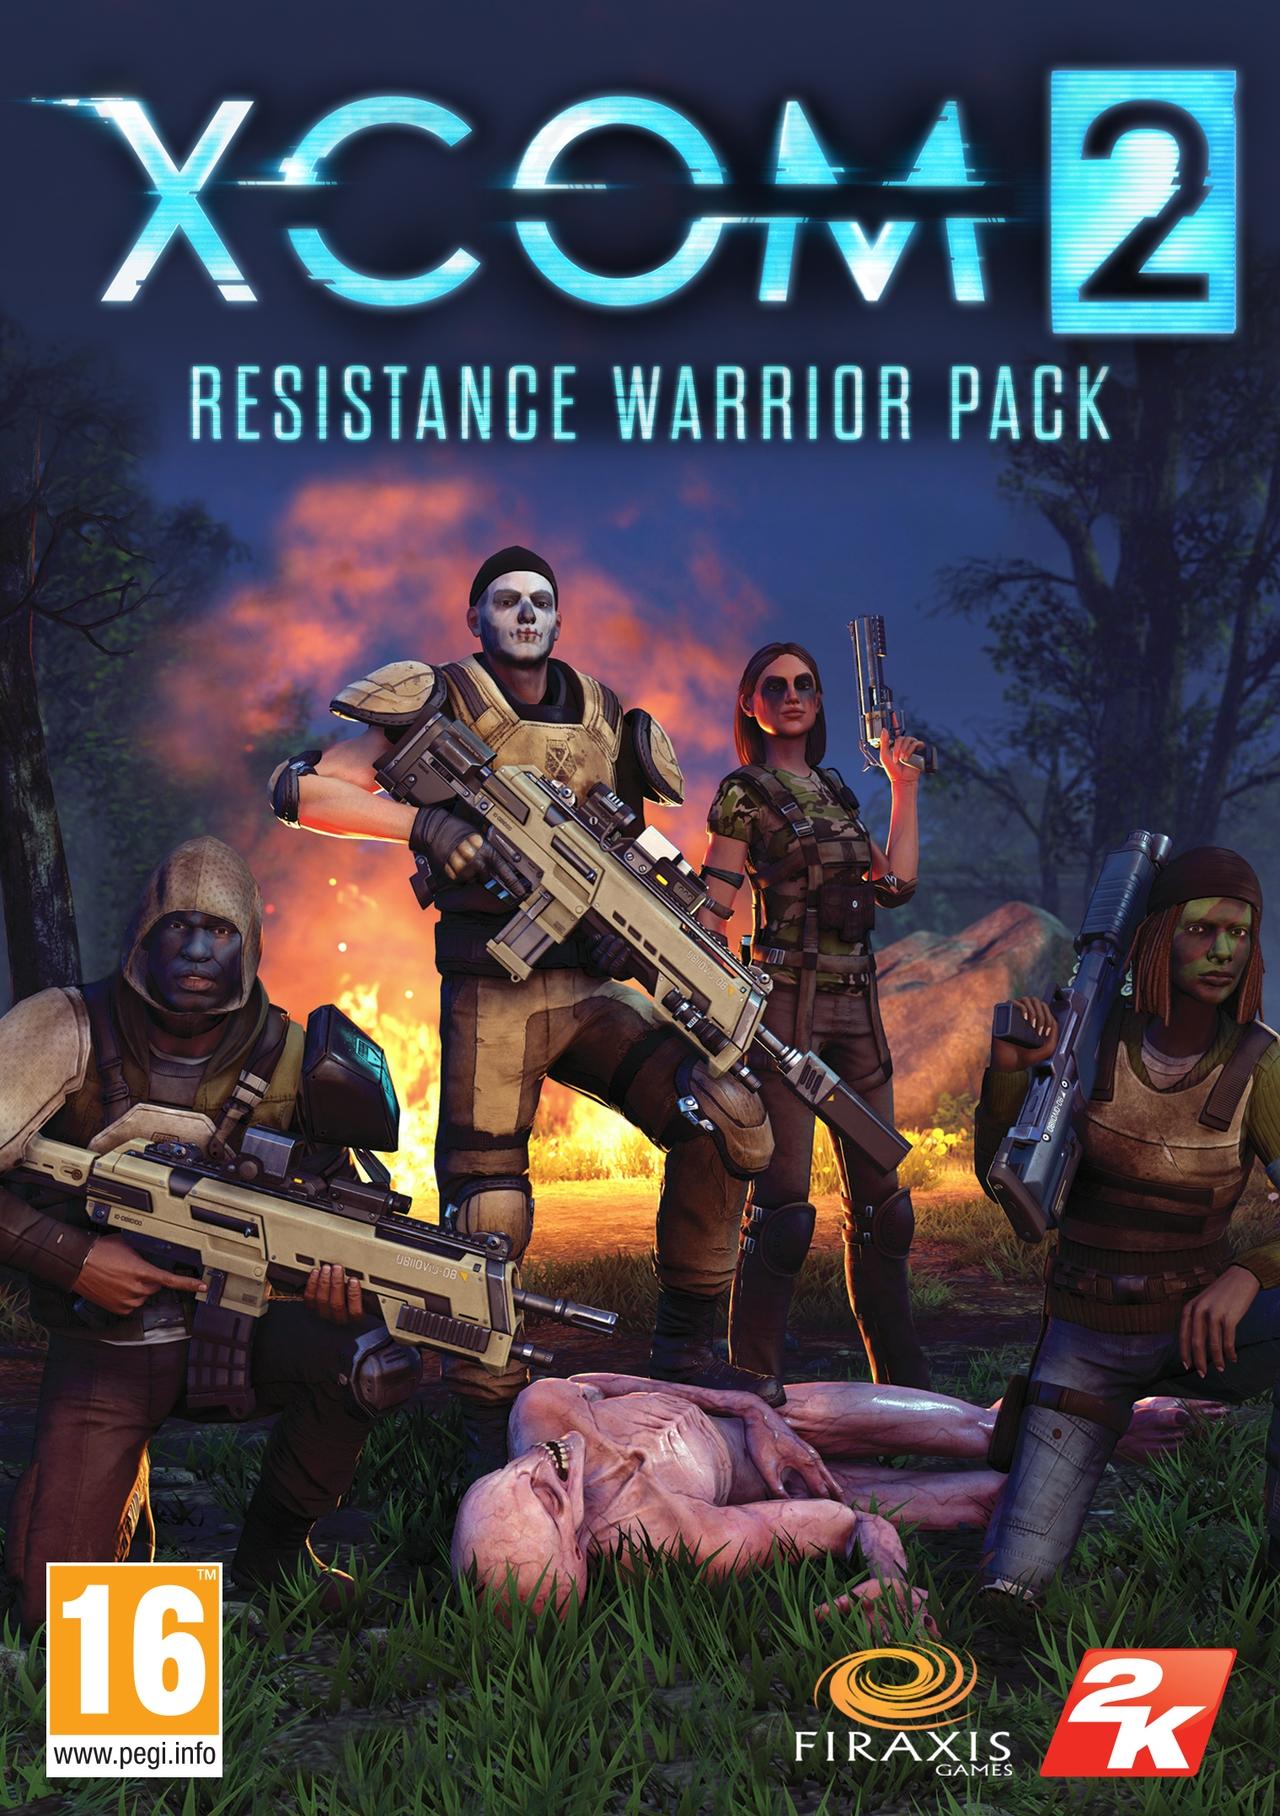 XCOM 2: Resistance Warrior Pack DLC (PC/MAC/LX) PL DIGITAL